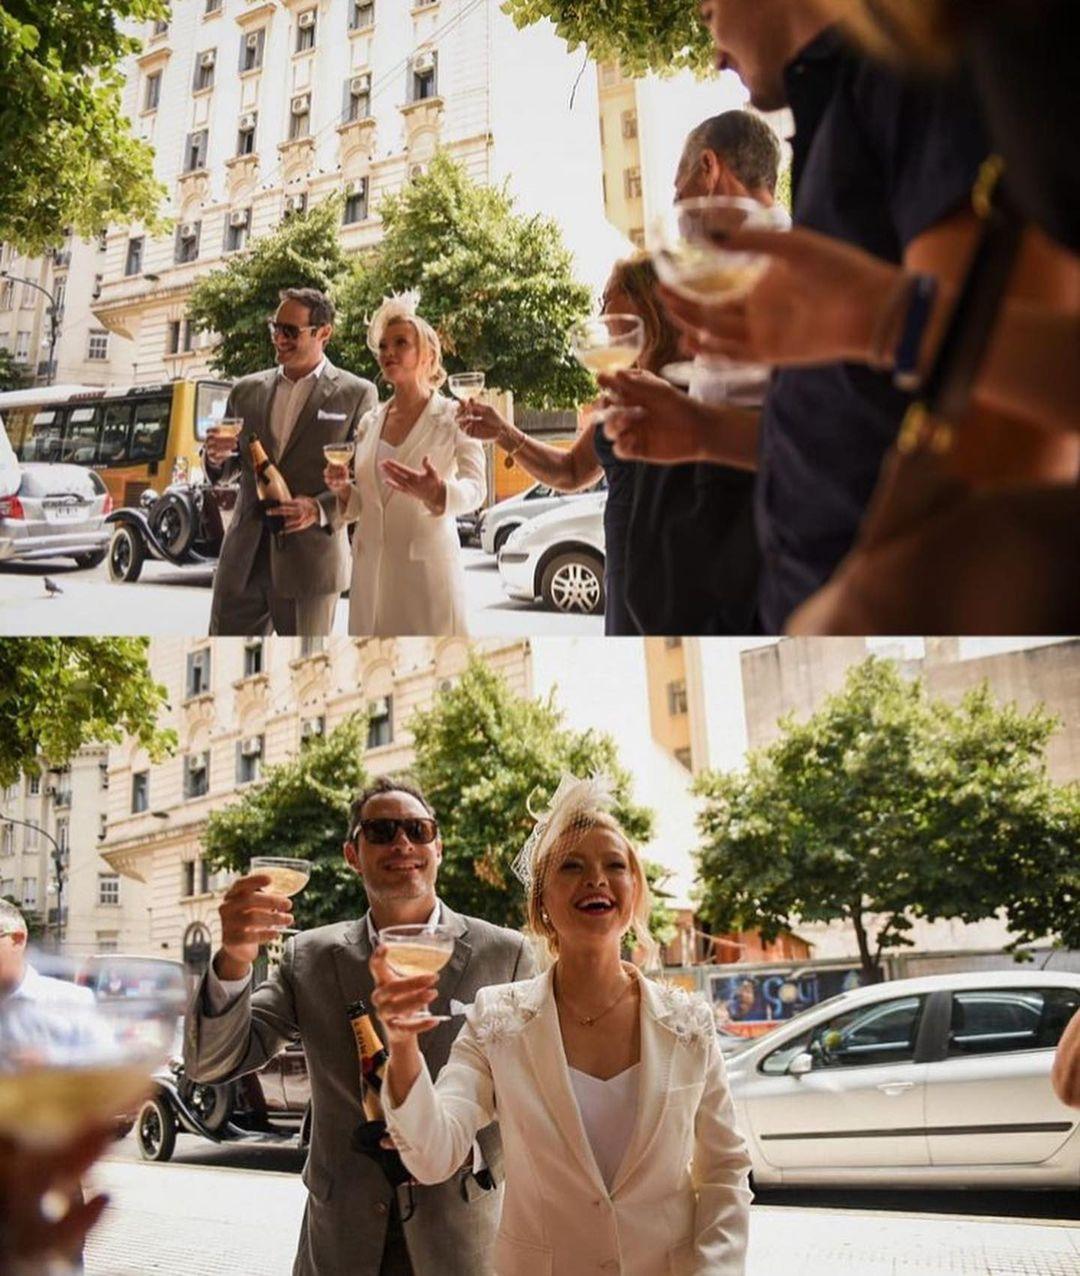 Сестра Егора Крида Полина вышла замуж! - фото №4